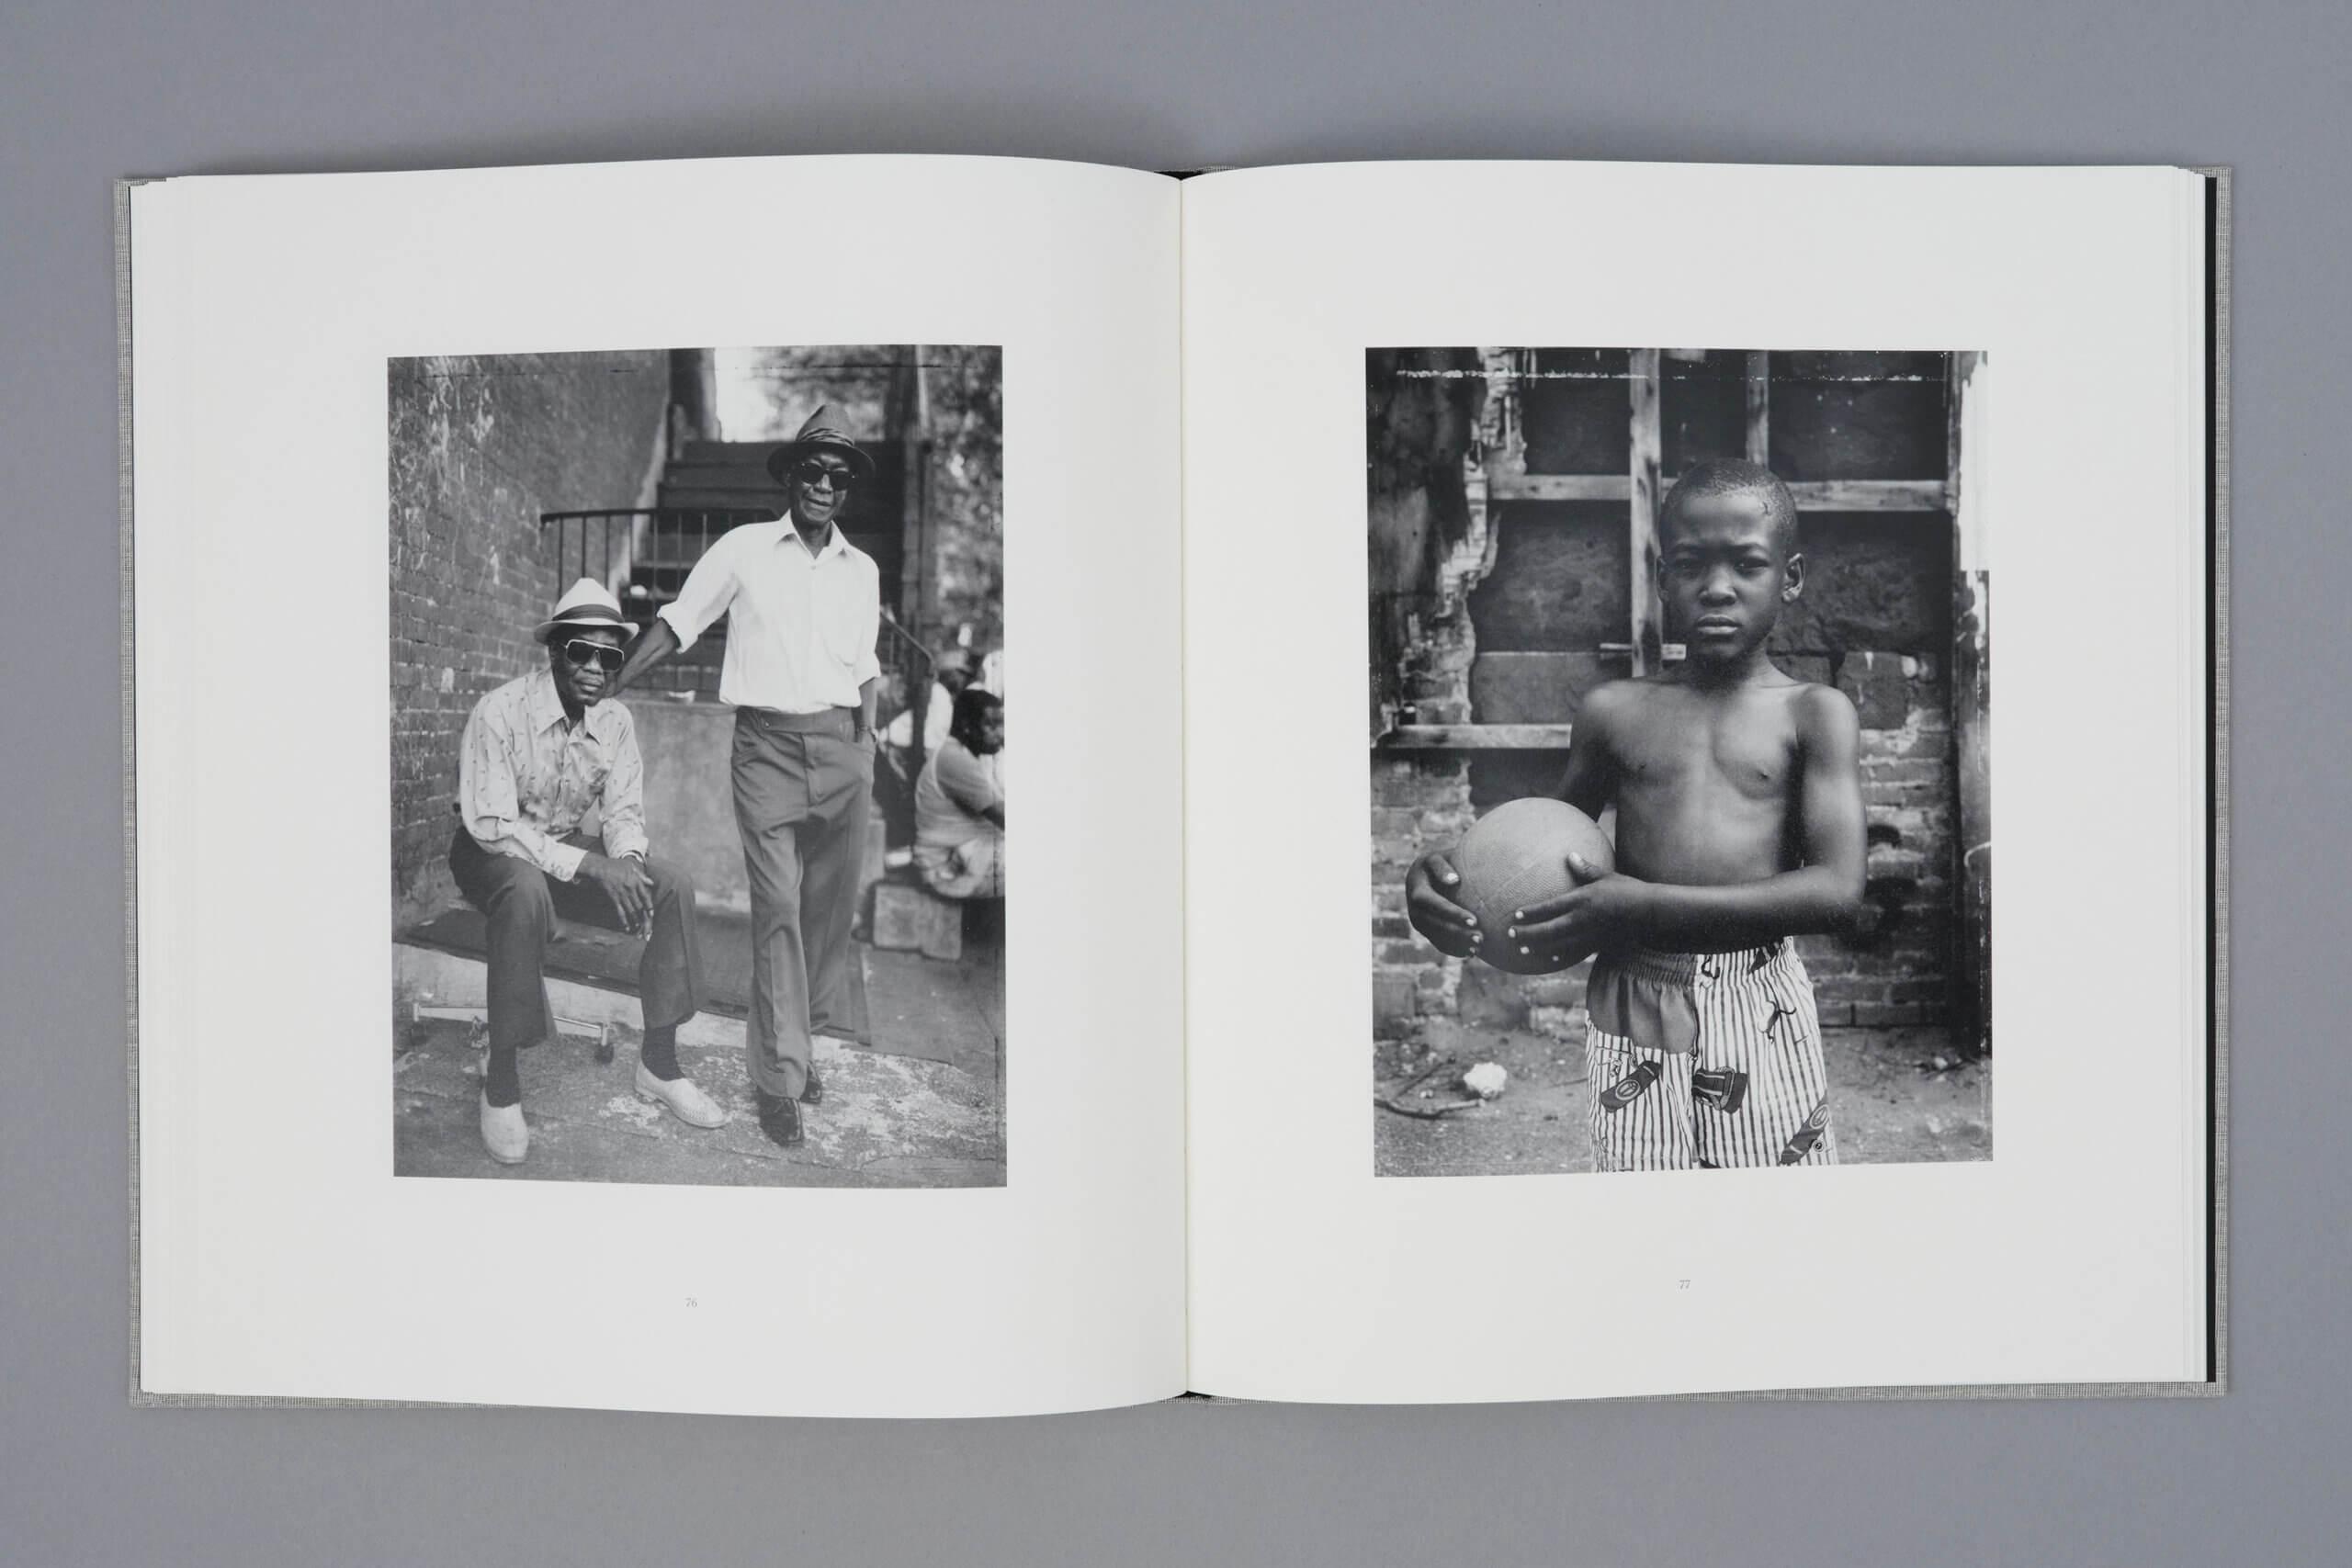 daoud-bey-street-portraits-1